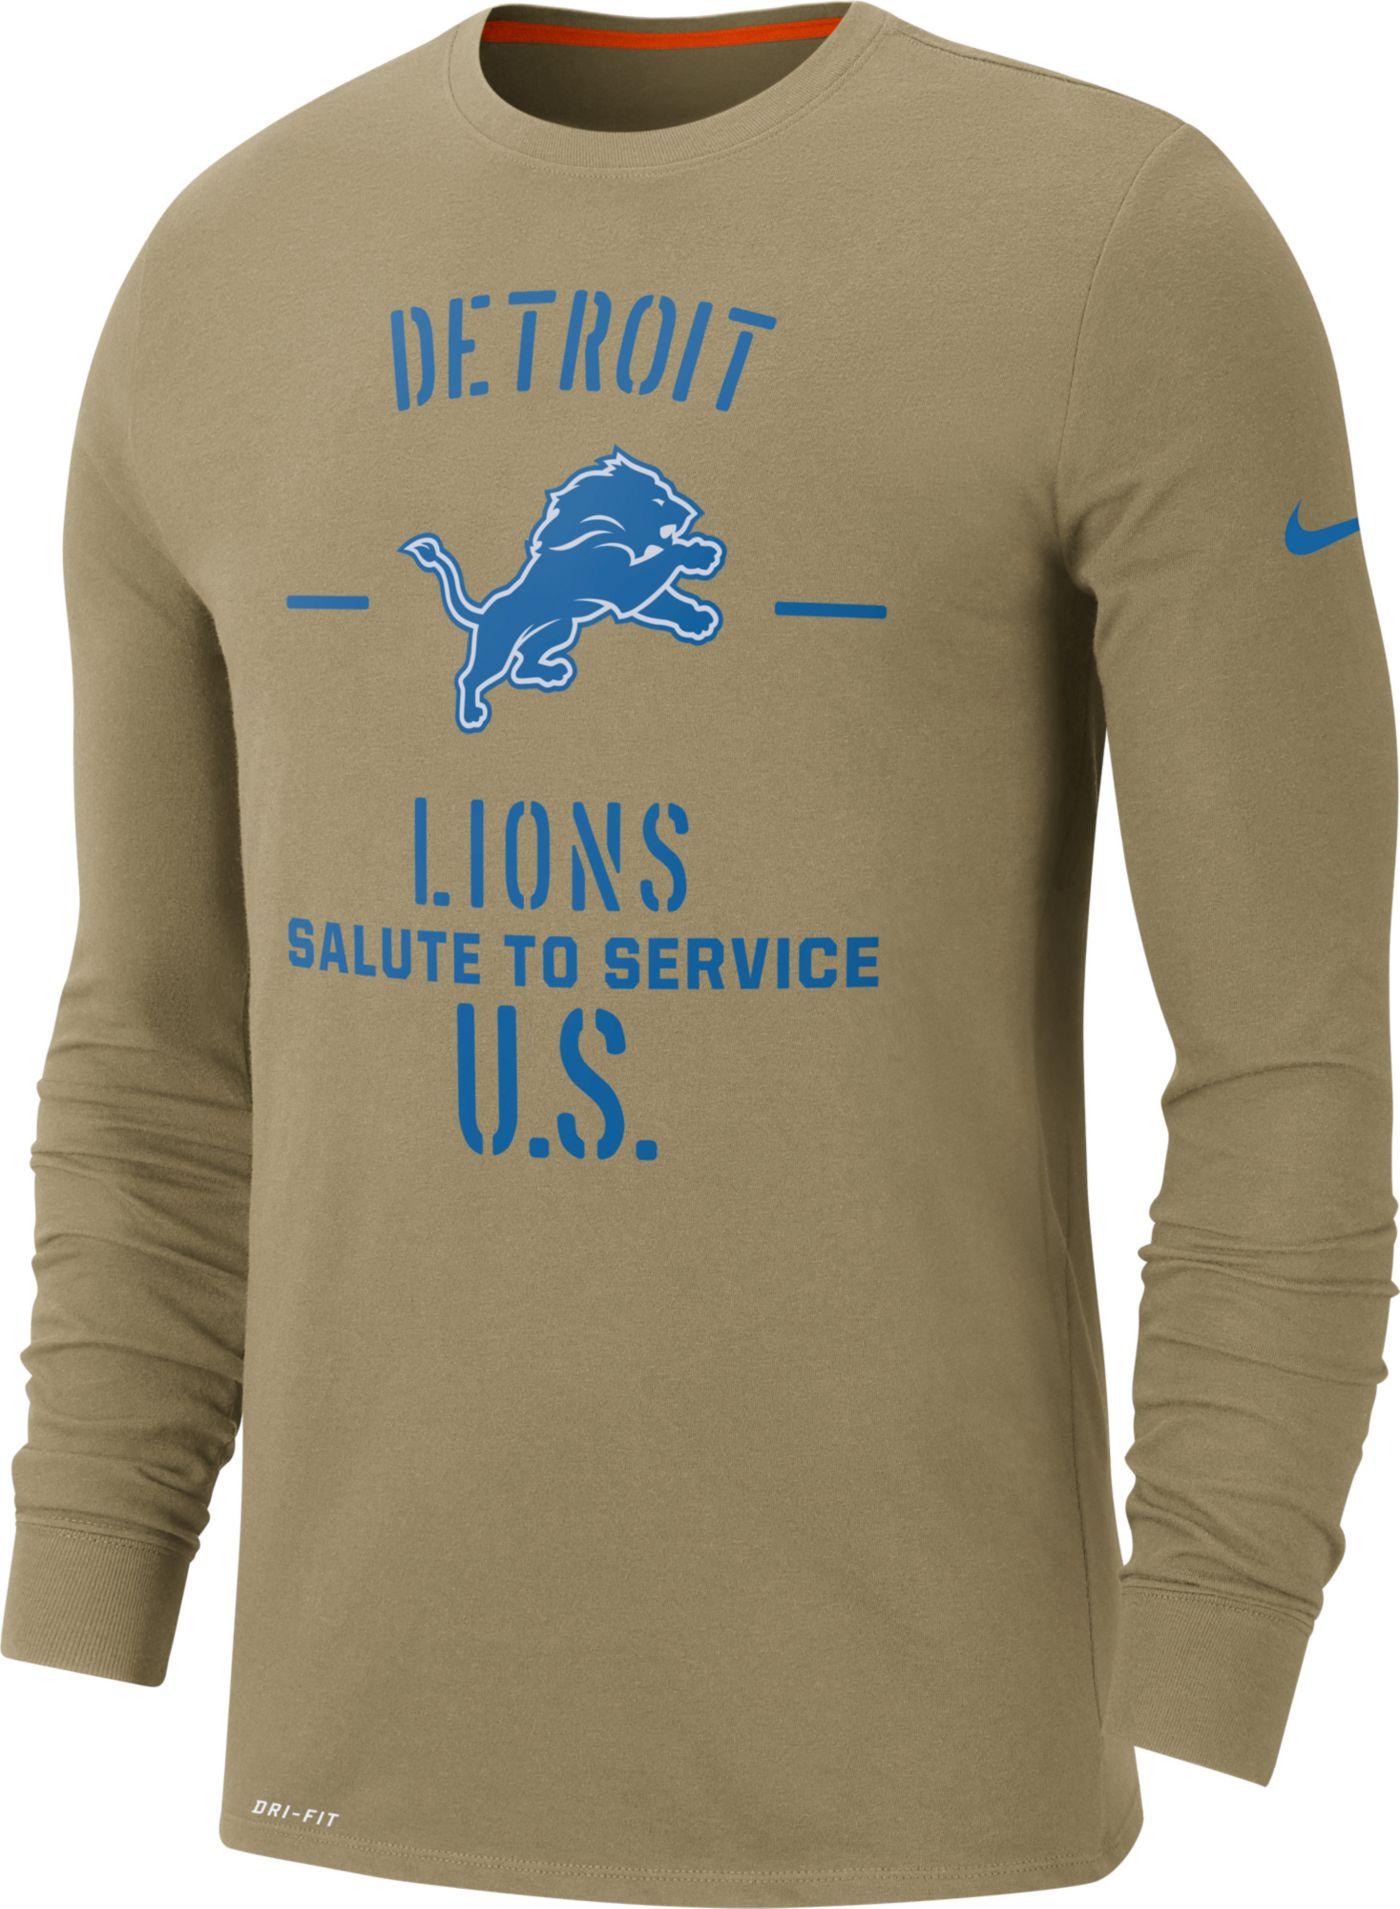 Nike Men's Salute to Service Detroit Lions Dri-FIT Beige Long Sleeve Shirt